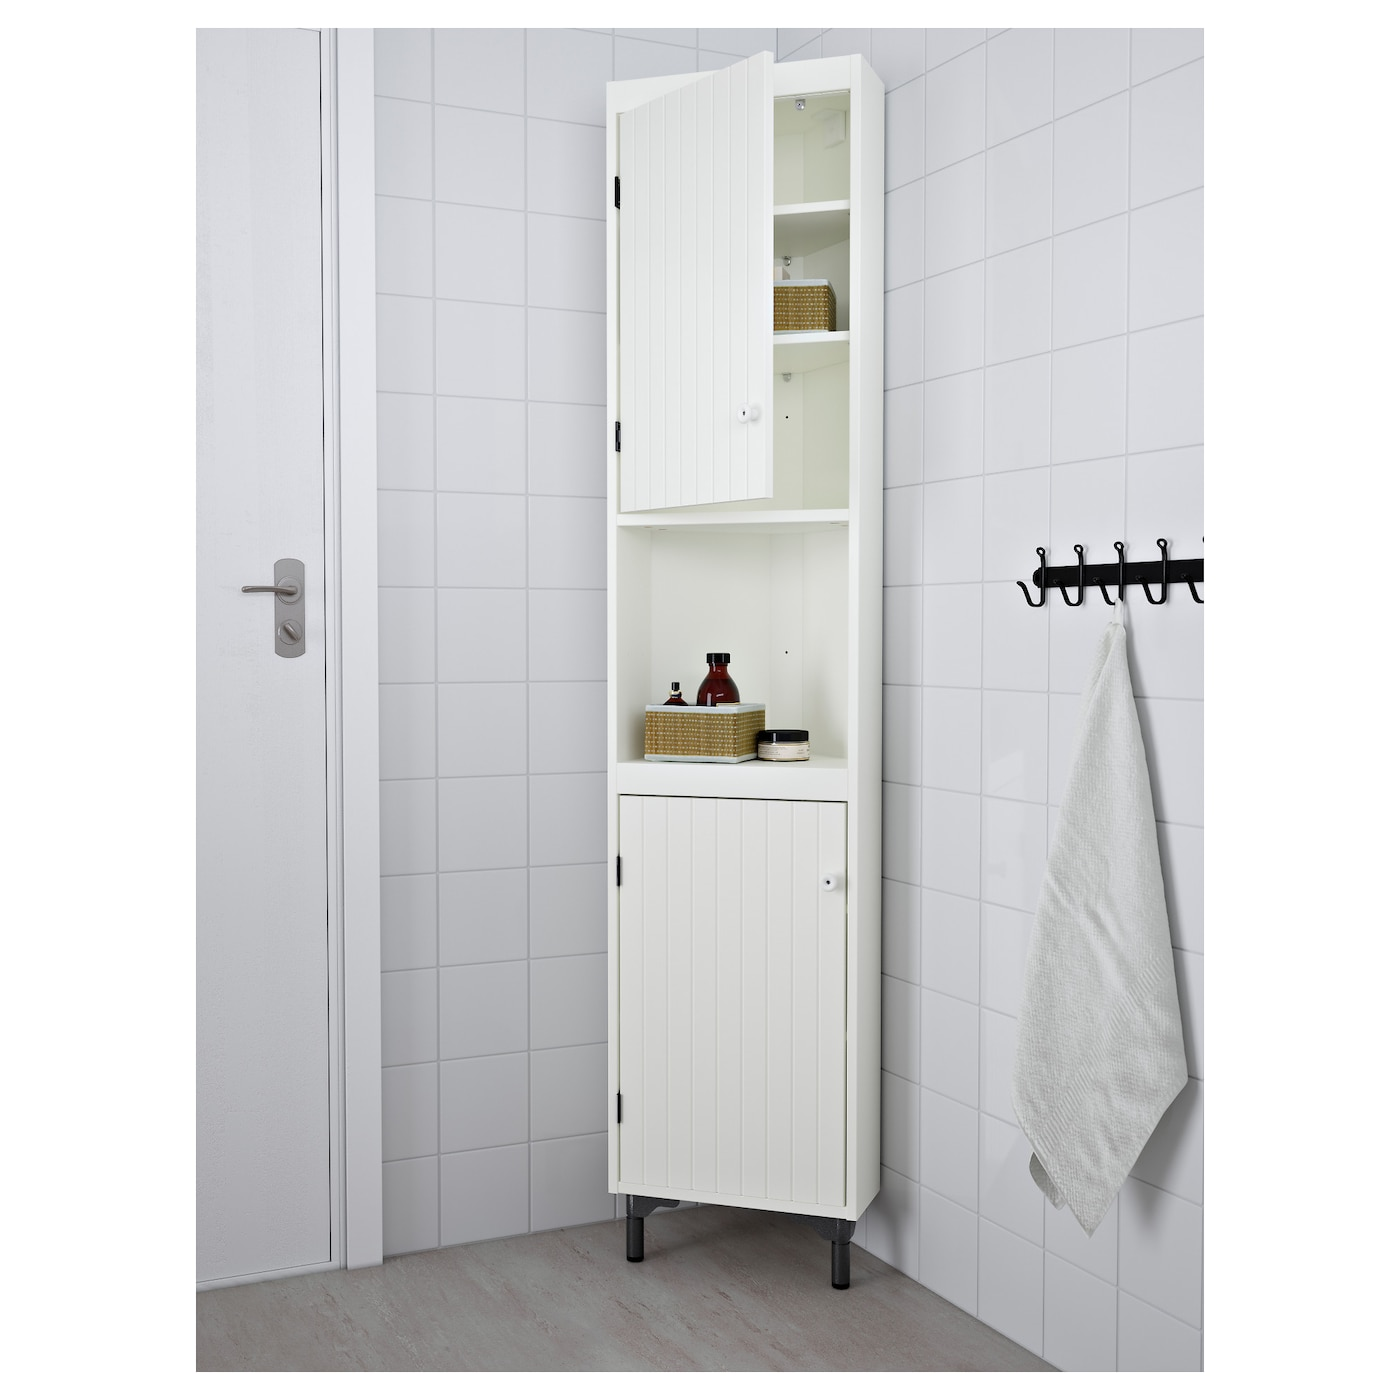 SILVERÅN Corner Unit White 40 Cm